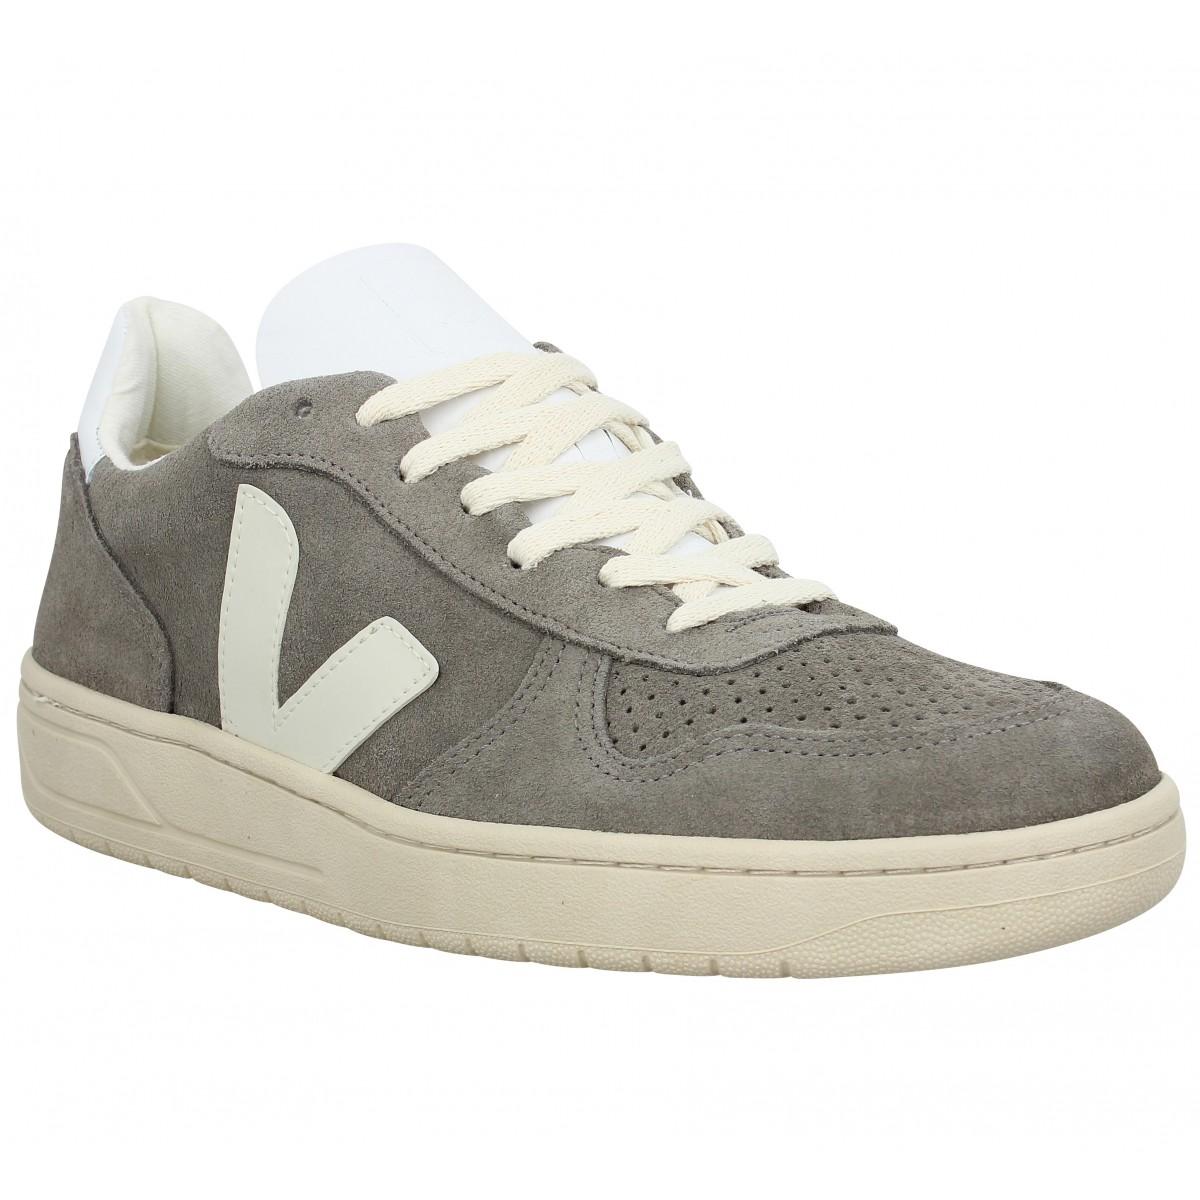 Veja Homme V10 Velours -45-gris